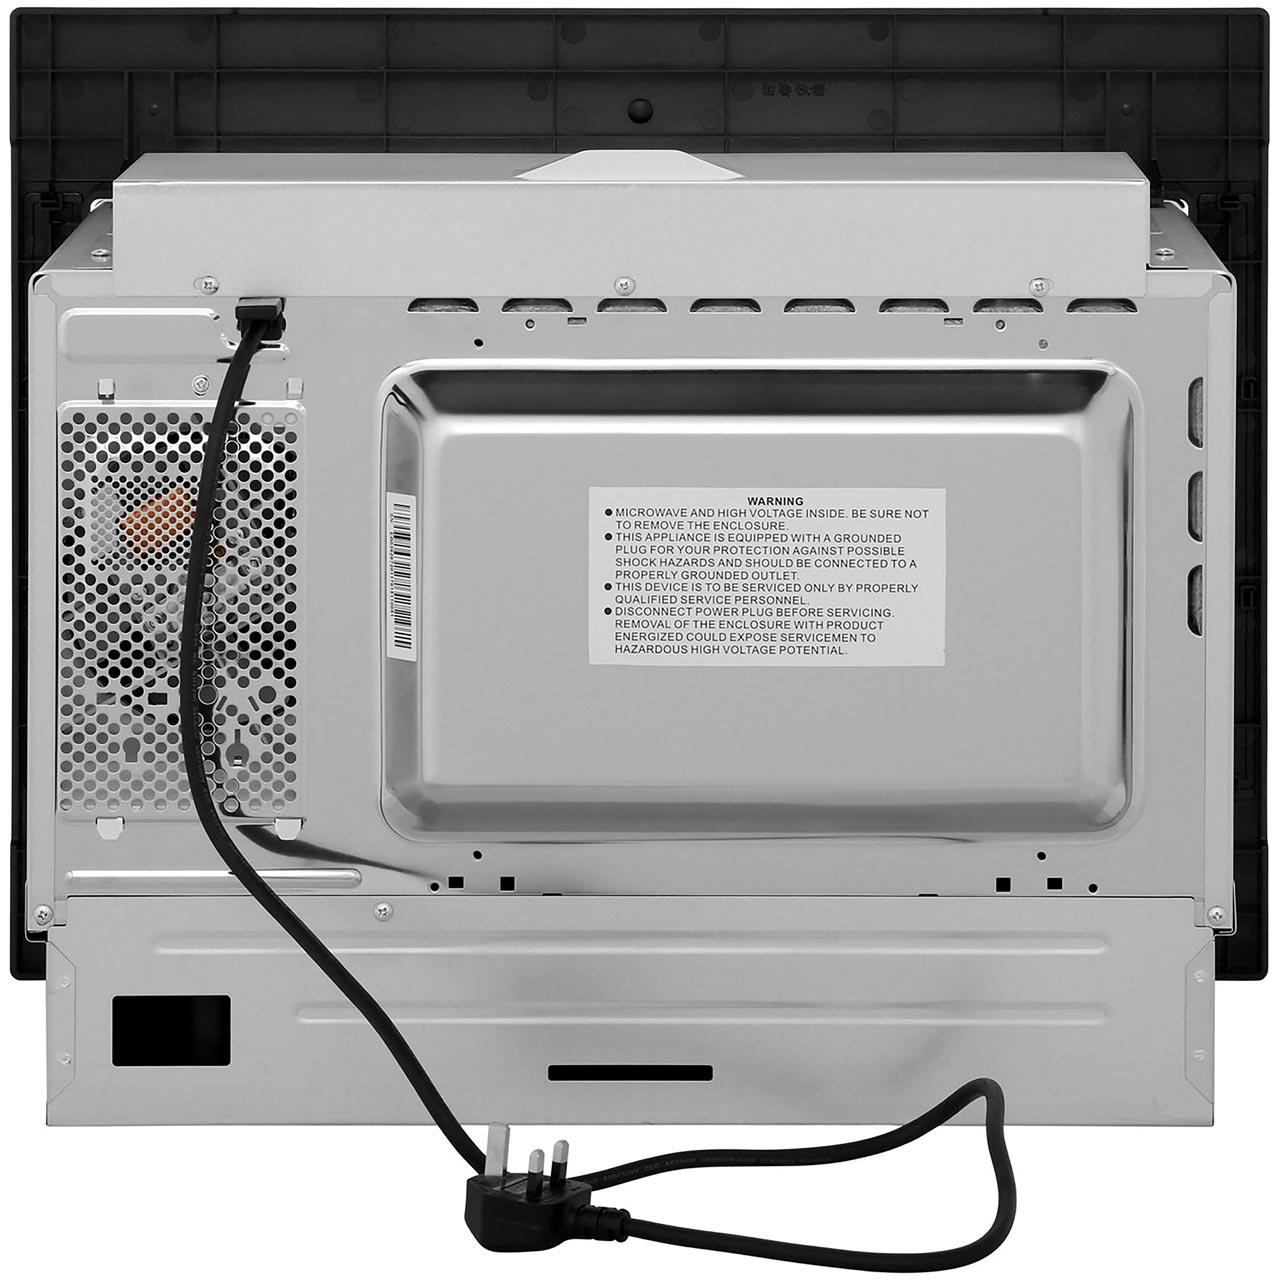 UIM600_SS | Newworld microwave | Built-in | ao.com